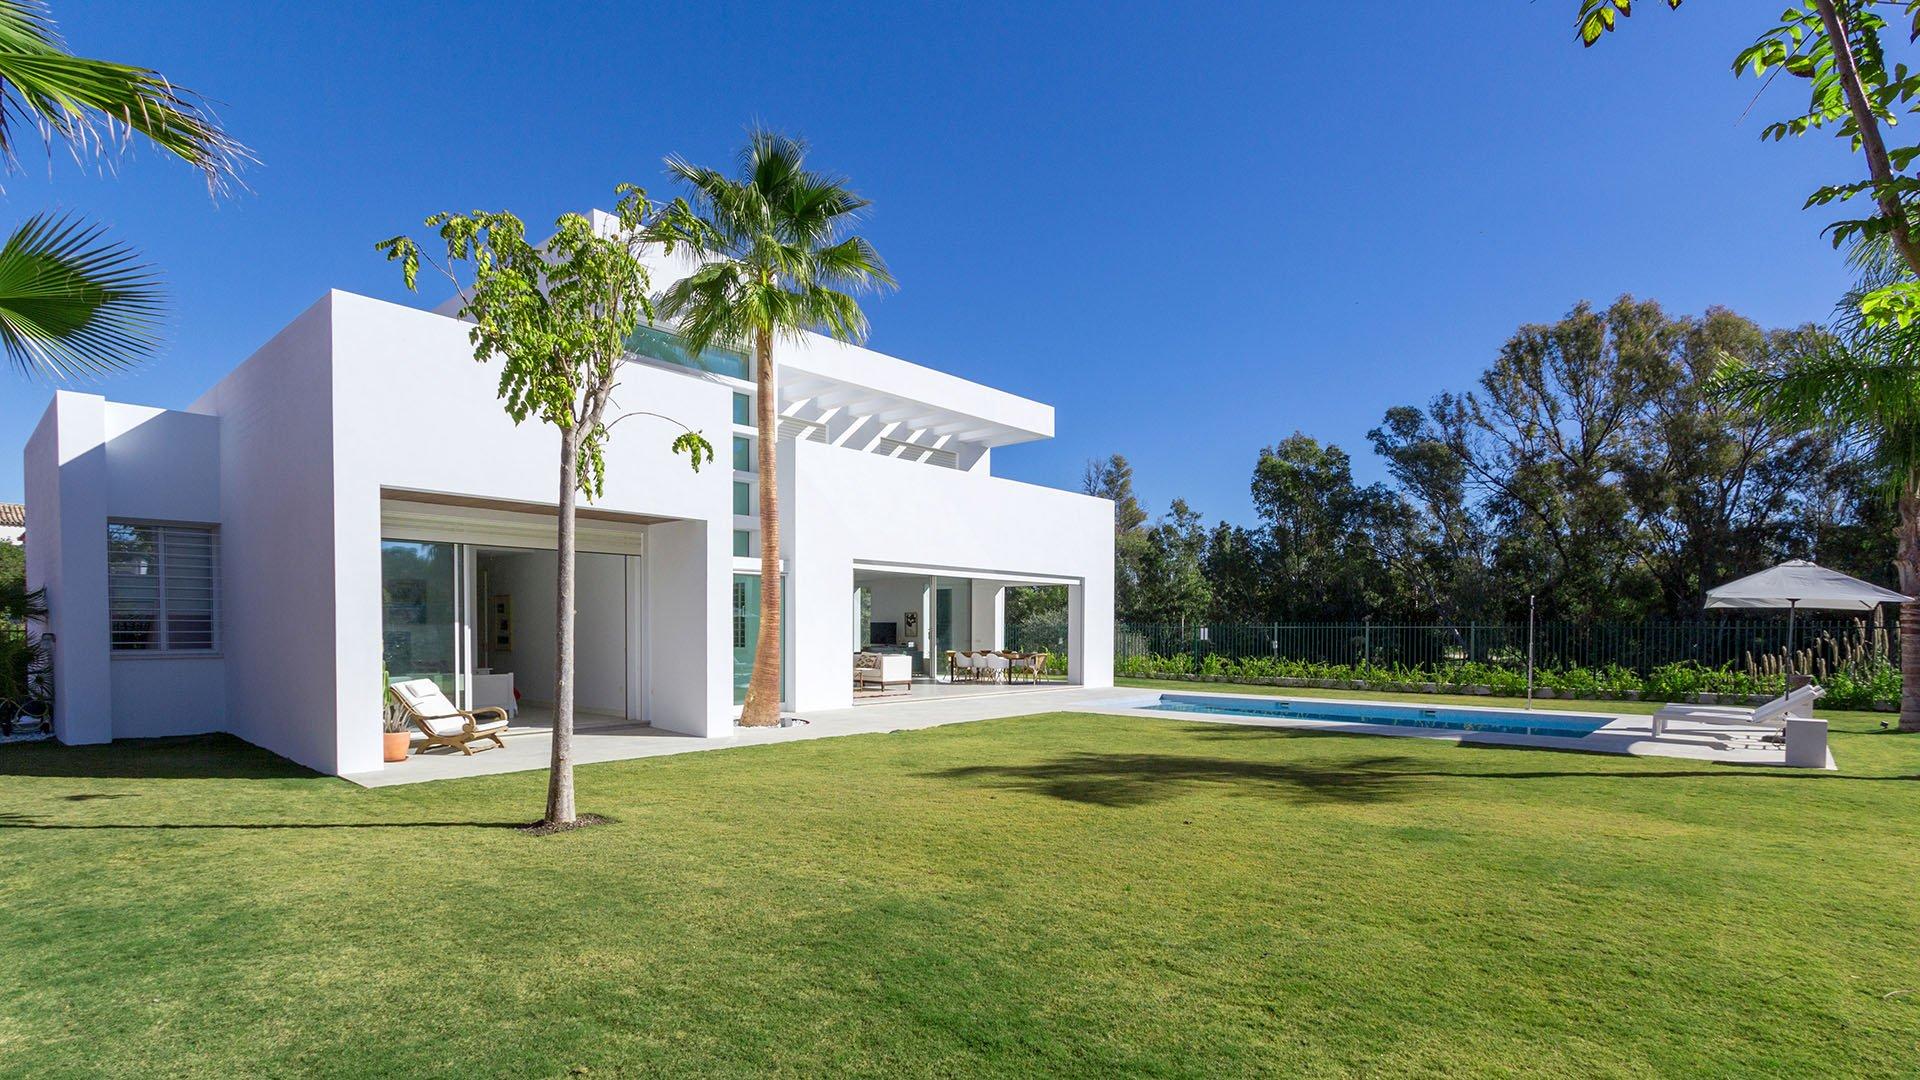 Villa Guadalmina Baja: Modern villa next to the Guadalmina Golf in Marbella